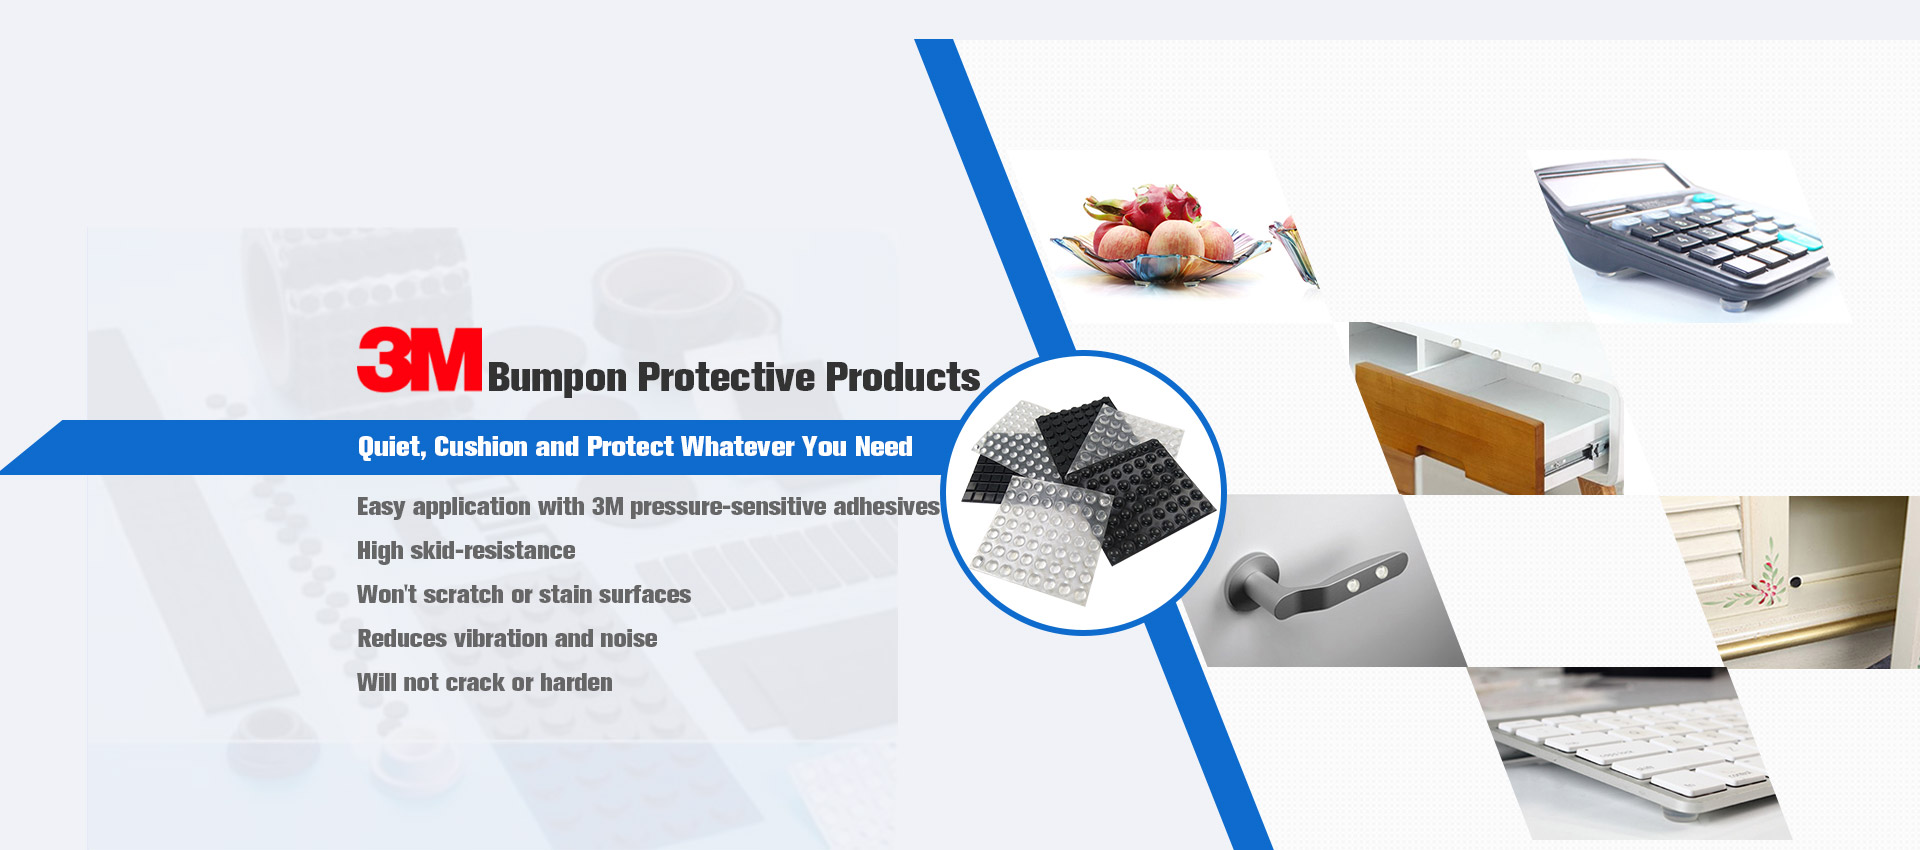 Bumpon/Protective